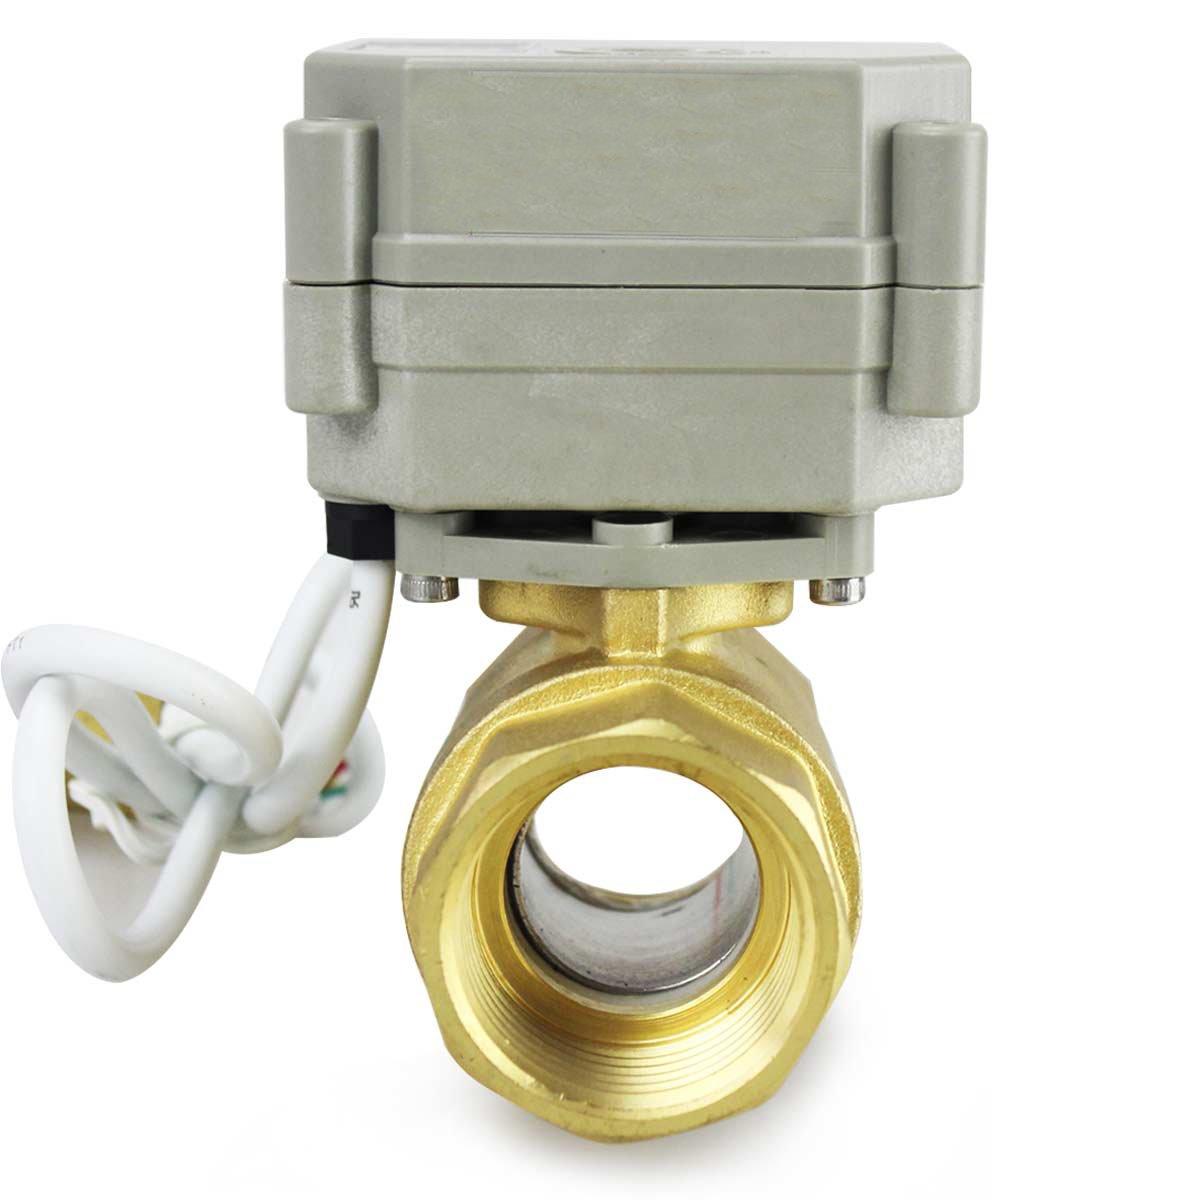 HSH-Flo 1//2 3//4 1 24VAC//DC 110VAC//220VAC 4-20ma 2 Way CF8 NPT Proportional Integral Control Motorized Ball Valve 1//2 110-240VAC